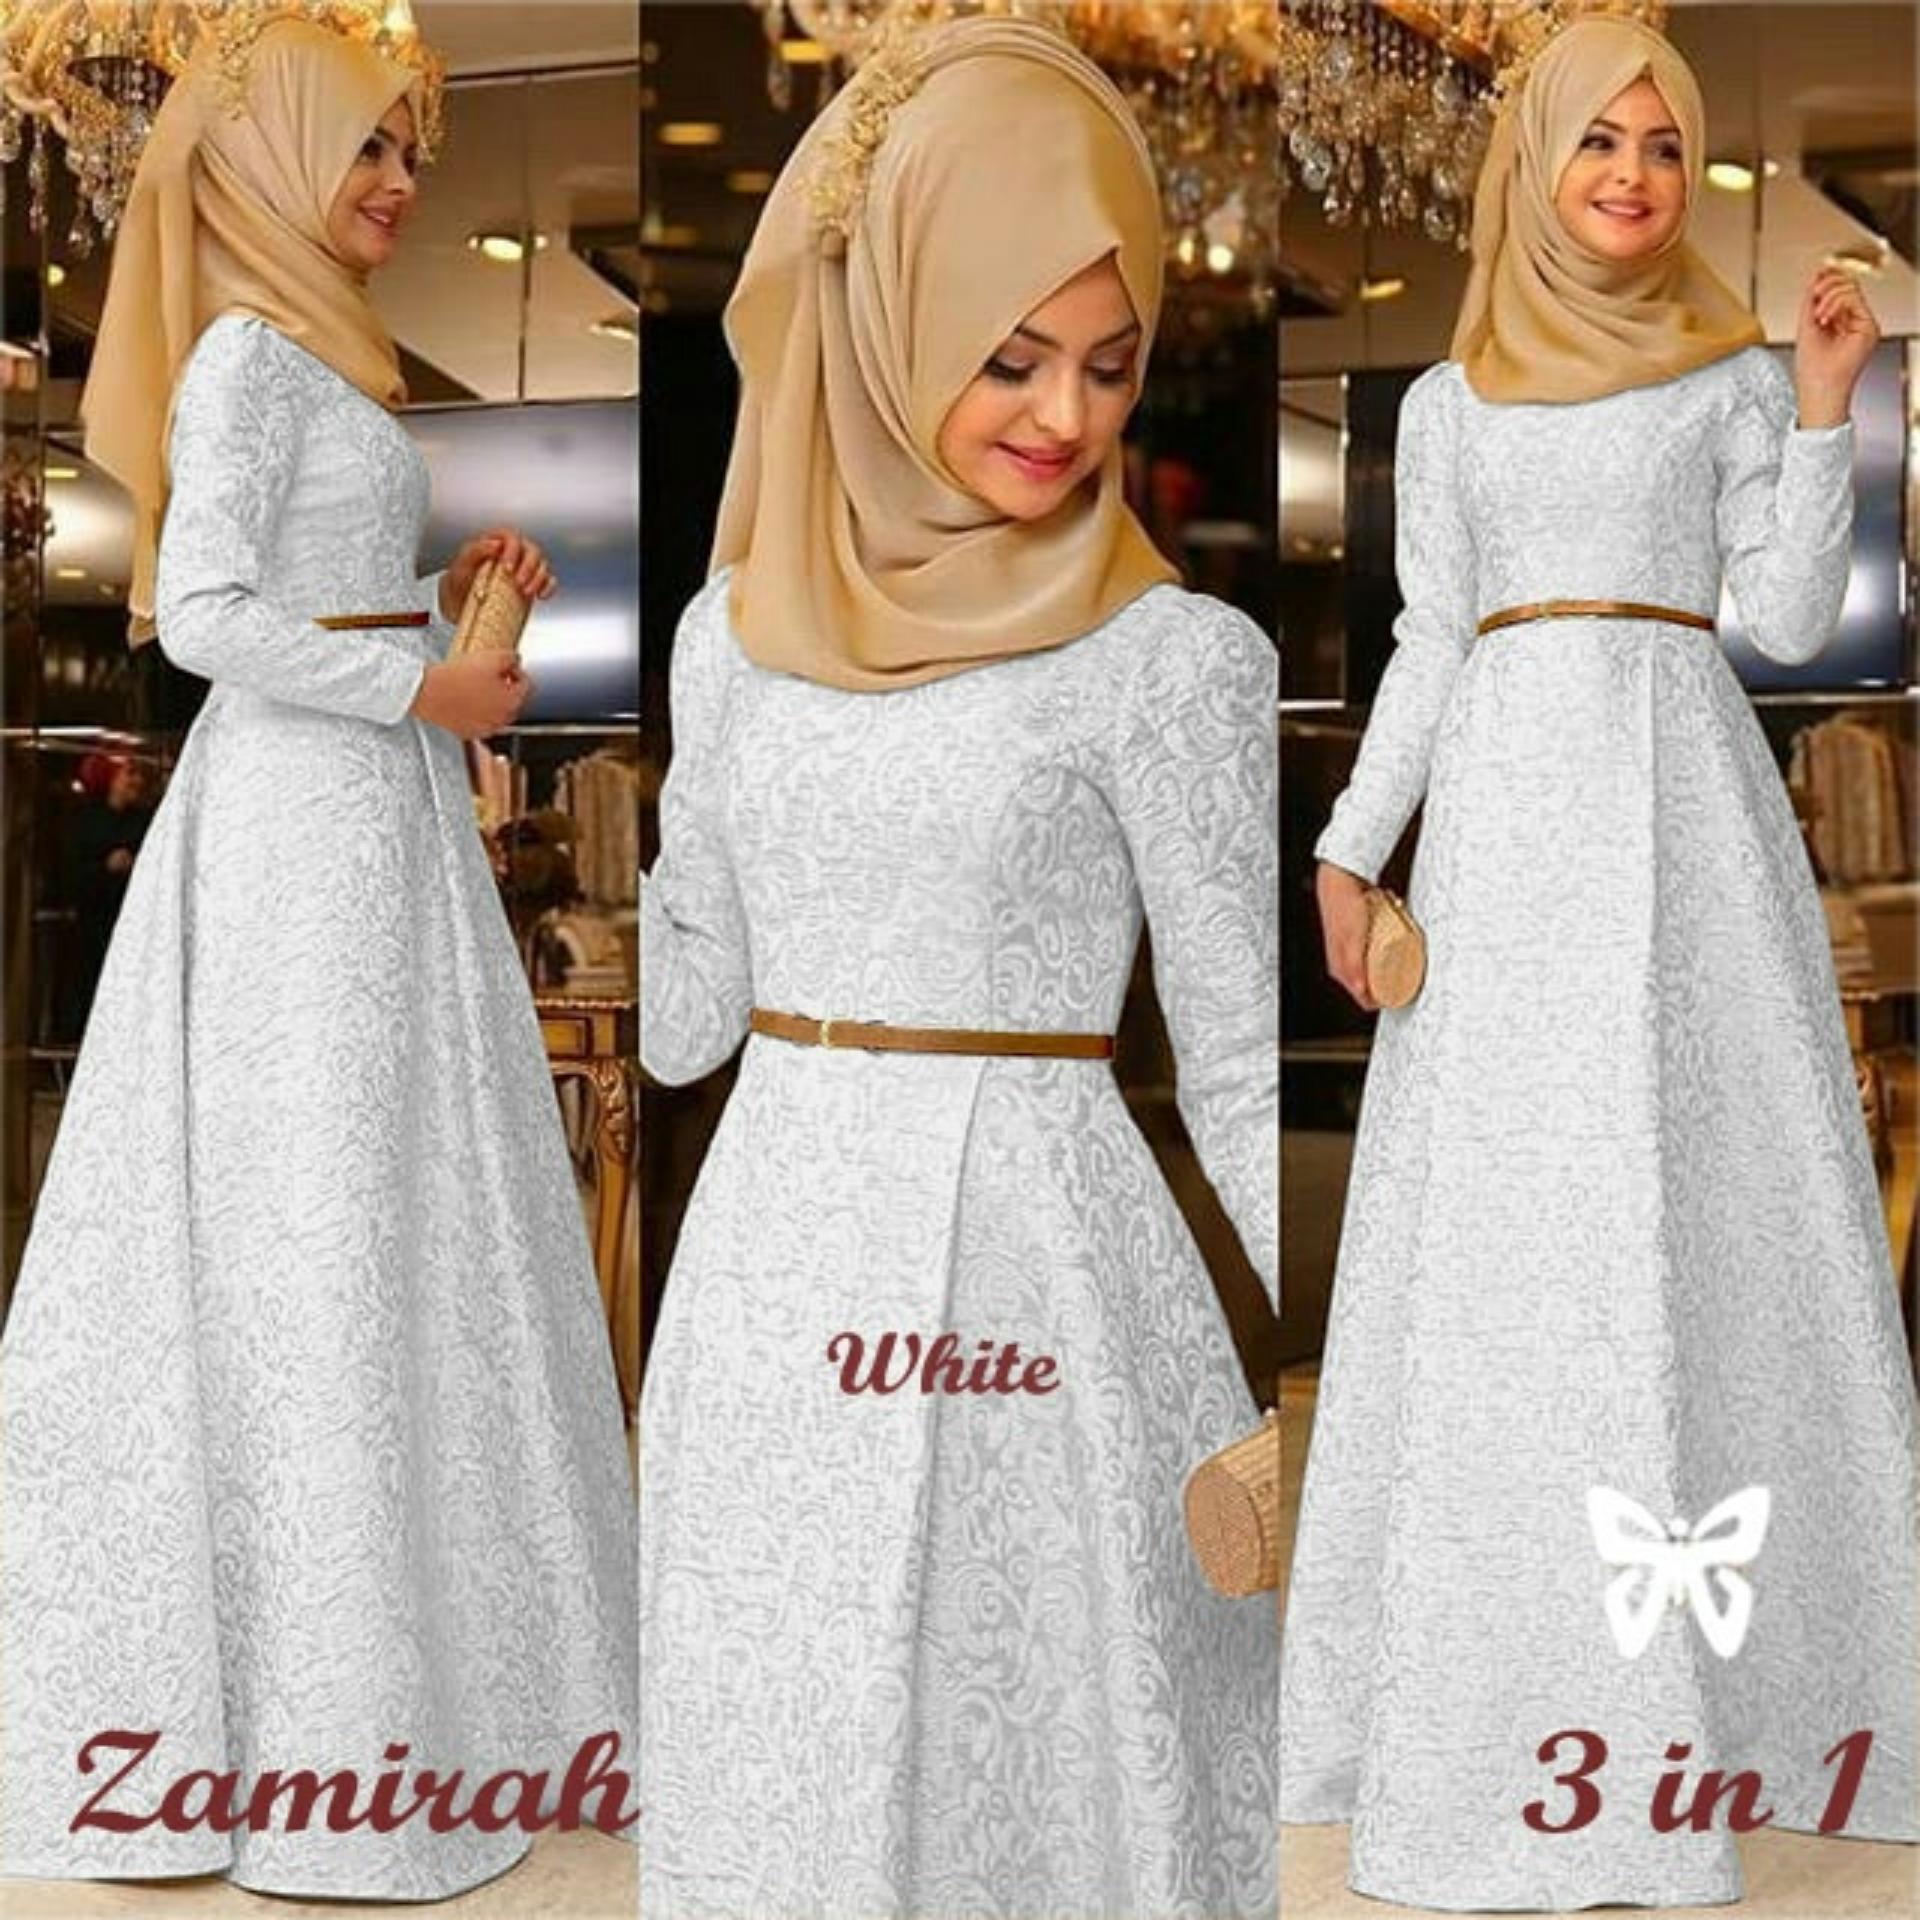 Baju Wanita Shop Dress Gamis Muslim Mirah / Hijab Muslim / Muslim Syari Hijab Syar'i / Busana Muslimah / Kebaya Modern Lebaran (Mirahza)  SS - Putih White / Gaun Pesta Lengan Panjang 2018